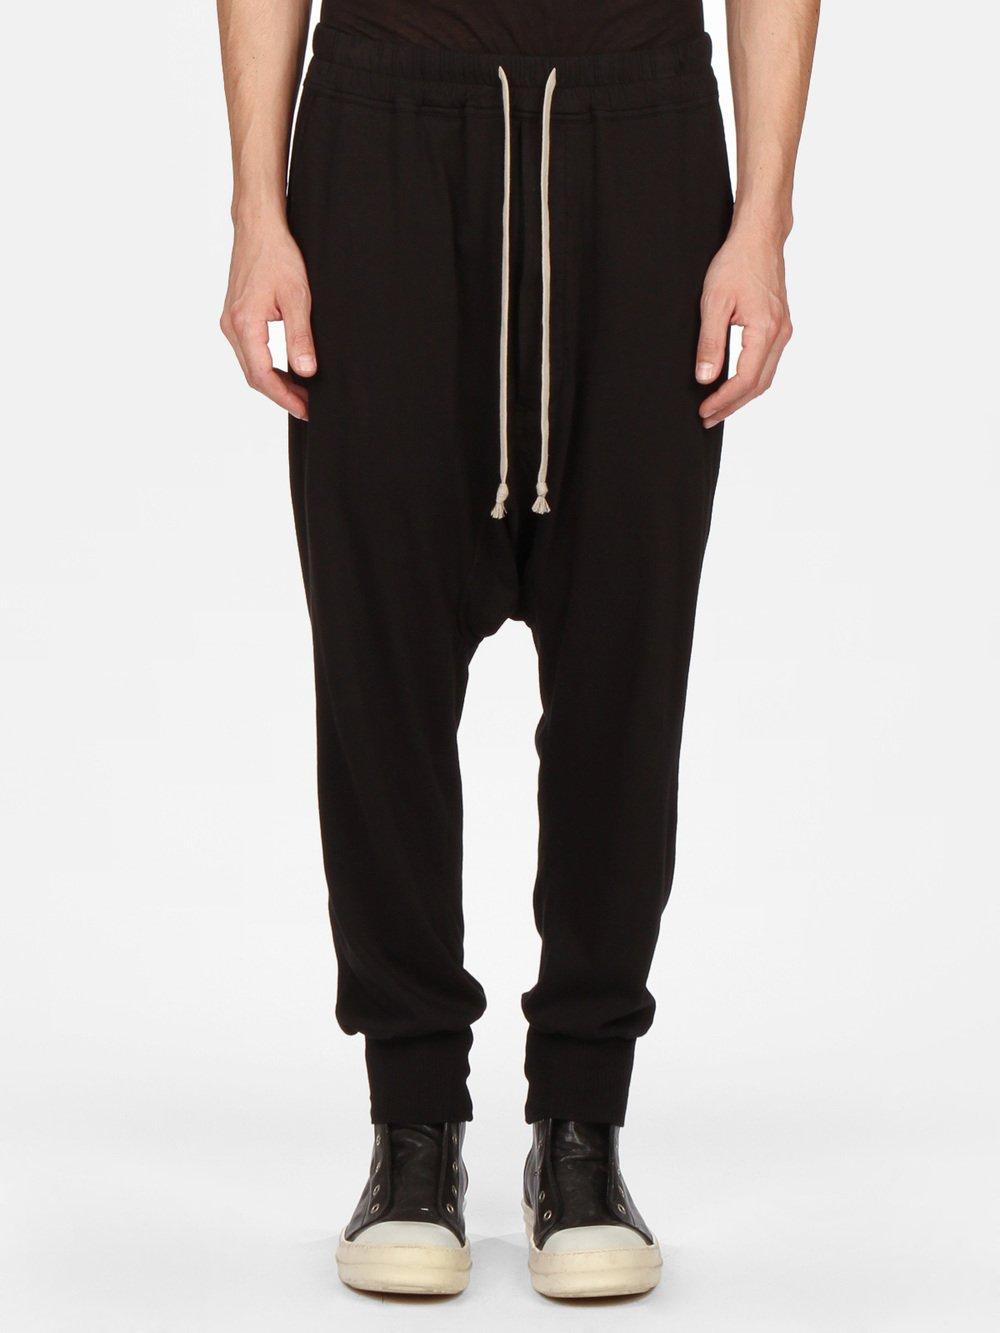 Pantalon Long Piste Cordon De Serrage - Noir Rick Owens 1AwxQm